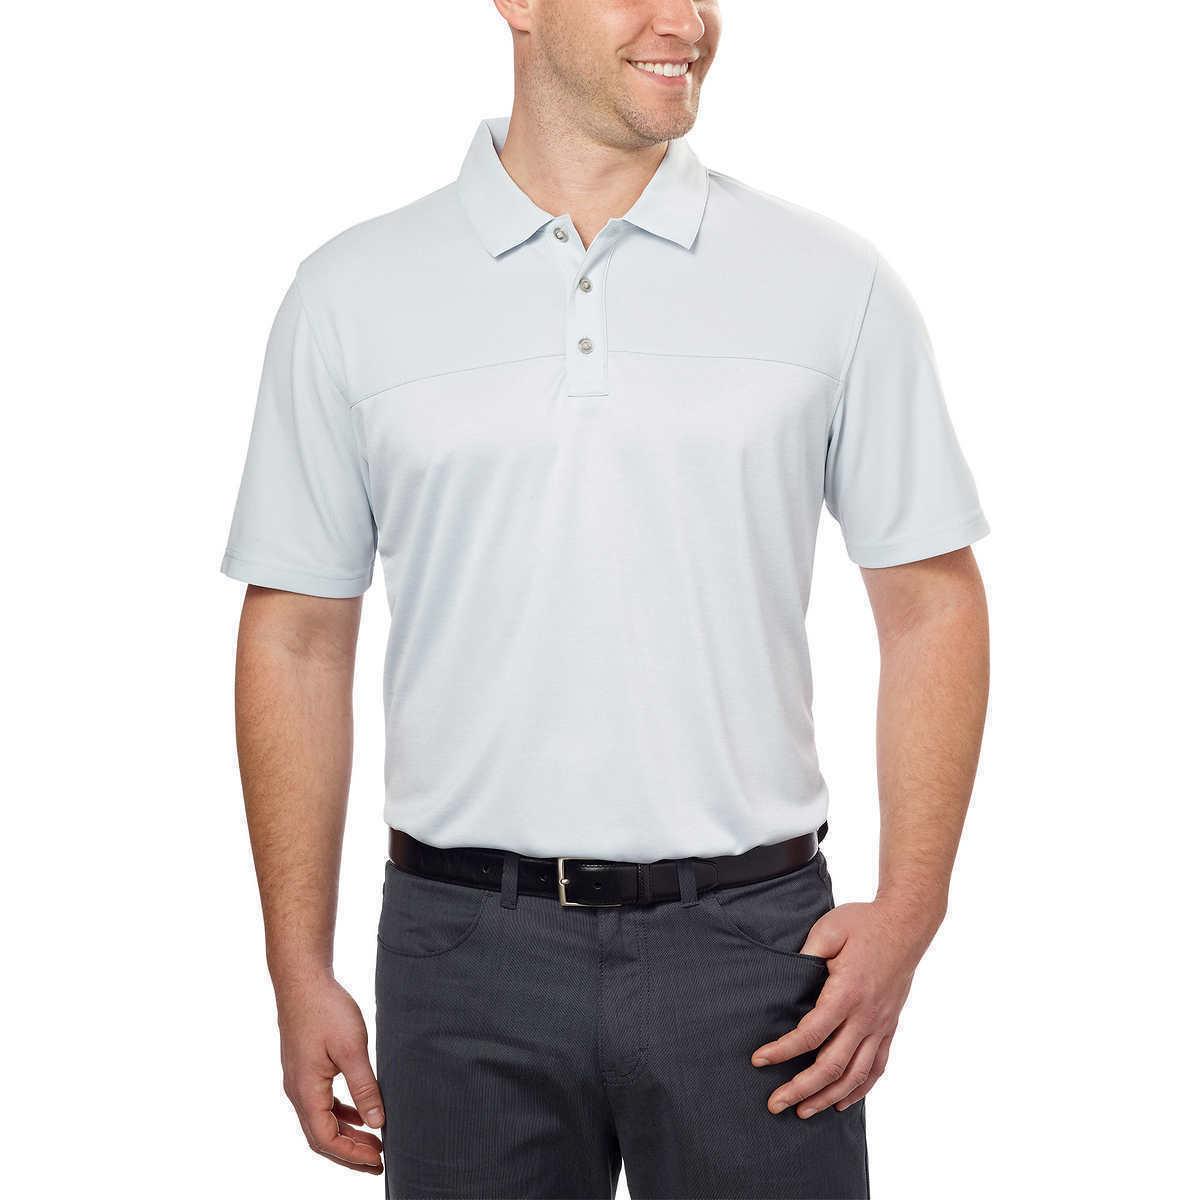 NEW Bollé Men's Color-block Performance Polo - Grey